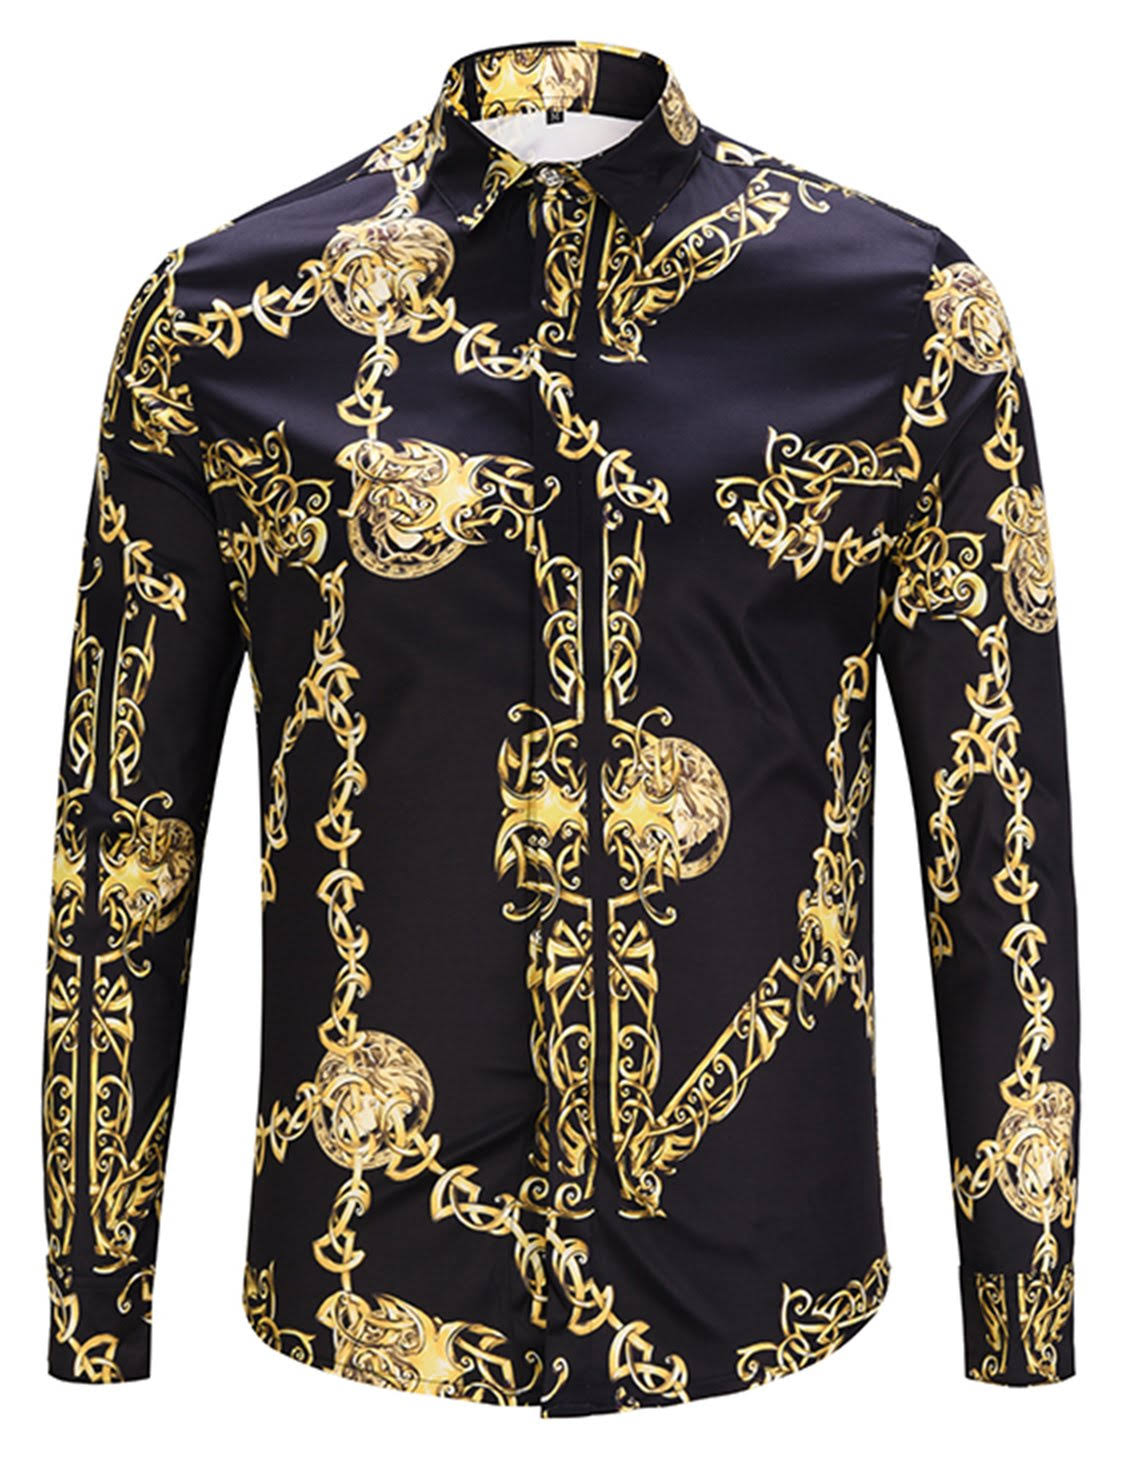 Design Langarm Pizoff Herren Luxus Shirt Dress Print pqxtB